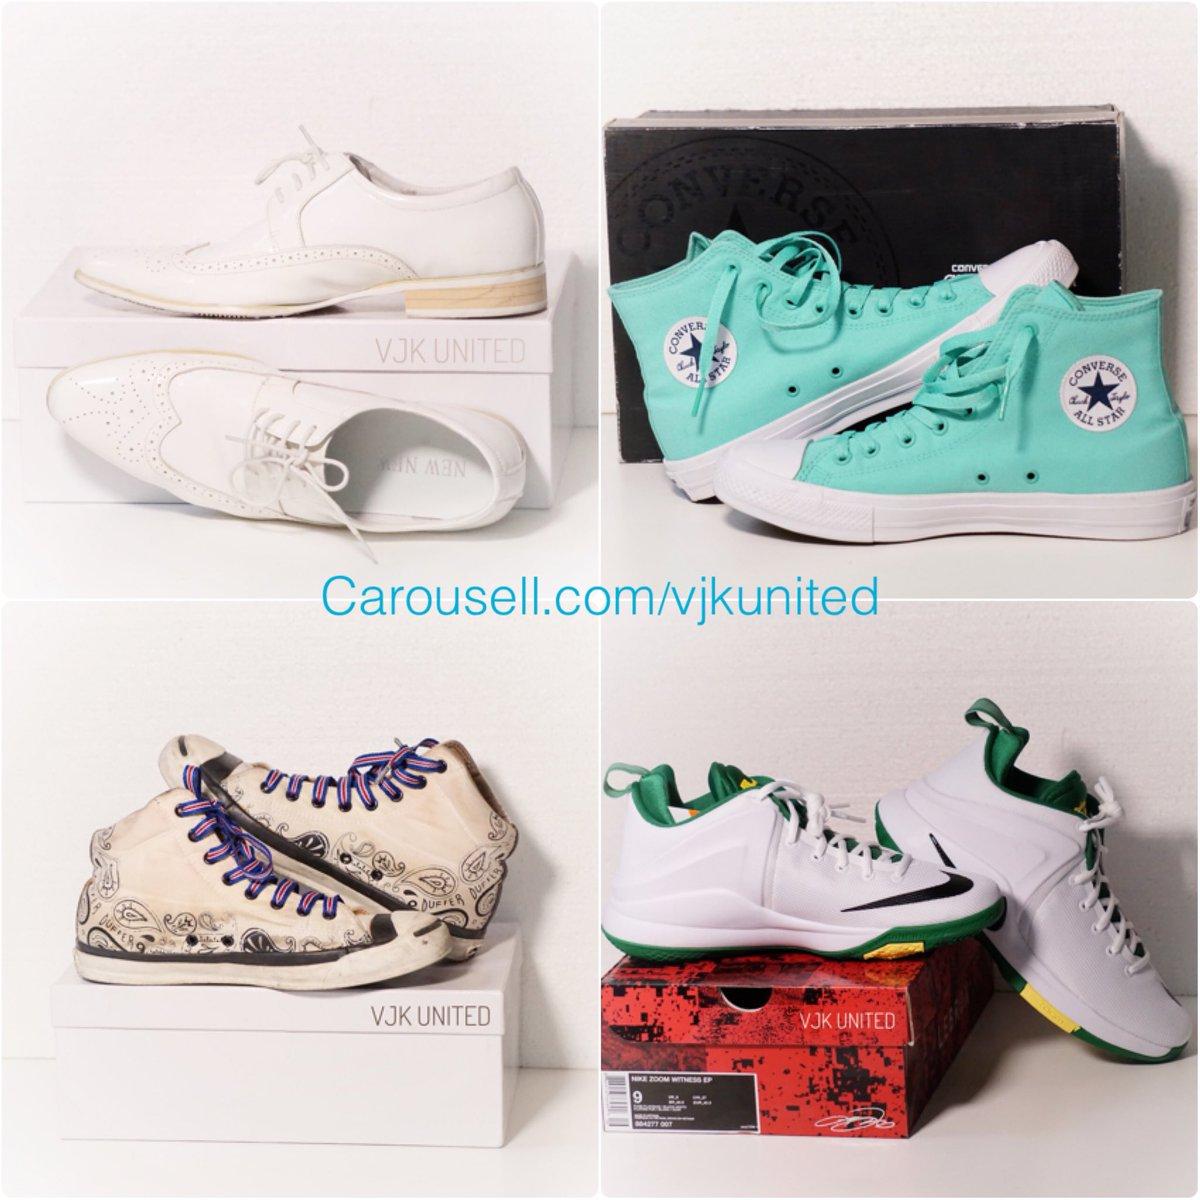 b45bc5a73464f9  Converse  Nike  brooks  Leathershoes  WhiteShoes  Reebok  Lotto   ReebokClassic  ChukTaylor  jackpurcellpic.twitter.com i7NHrMNMUJ